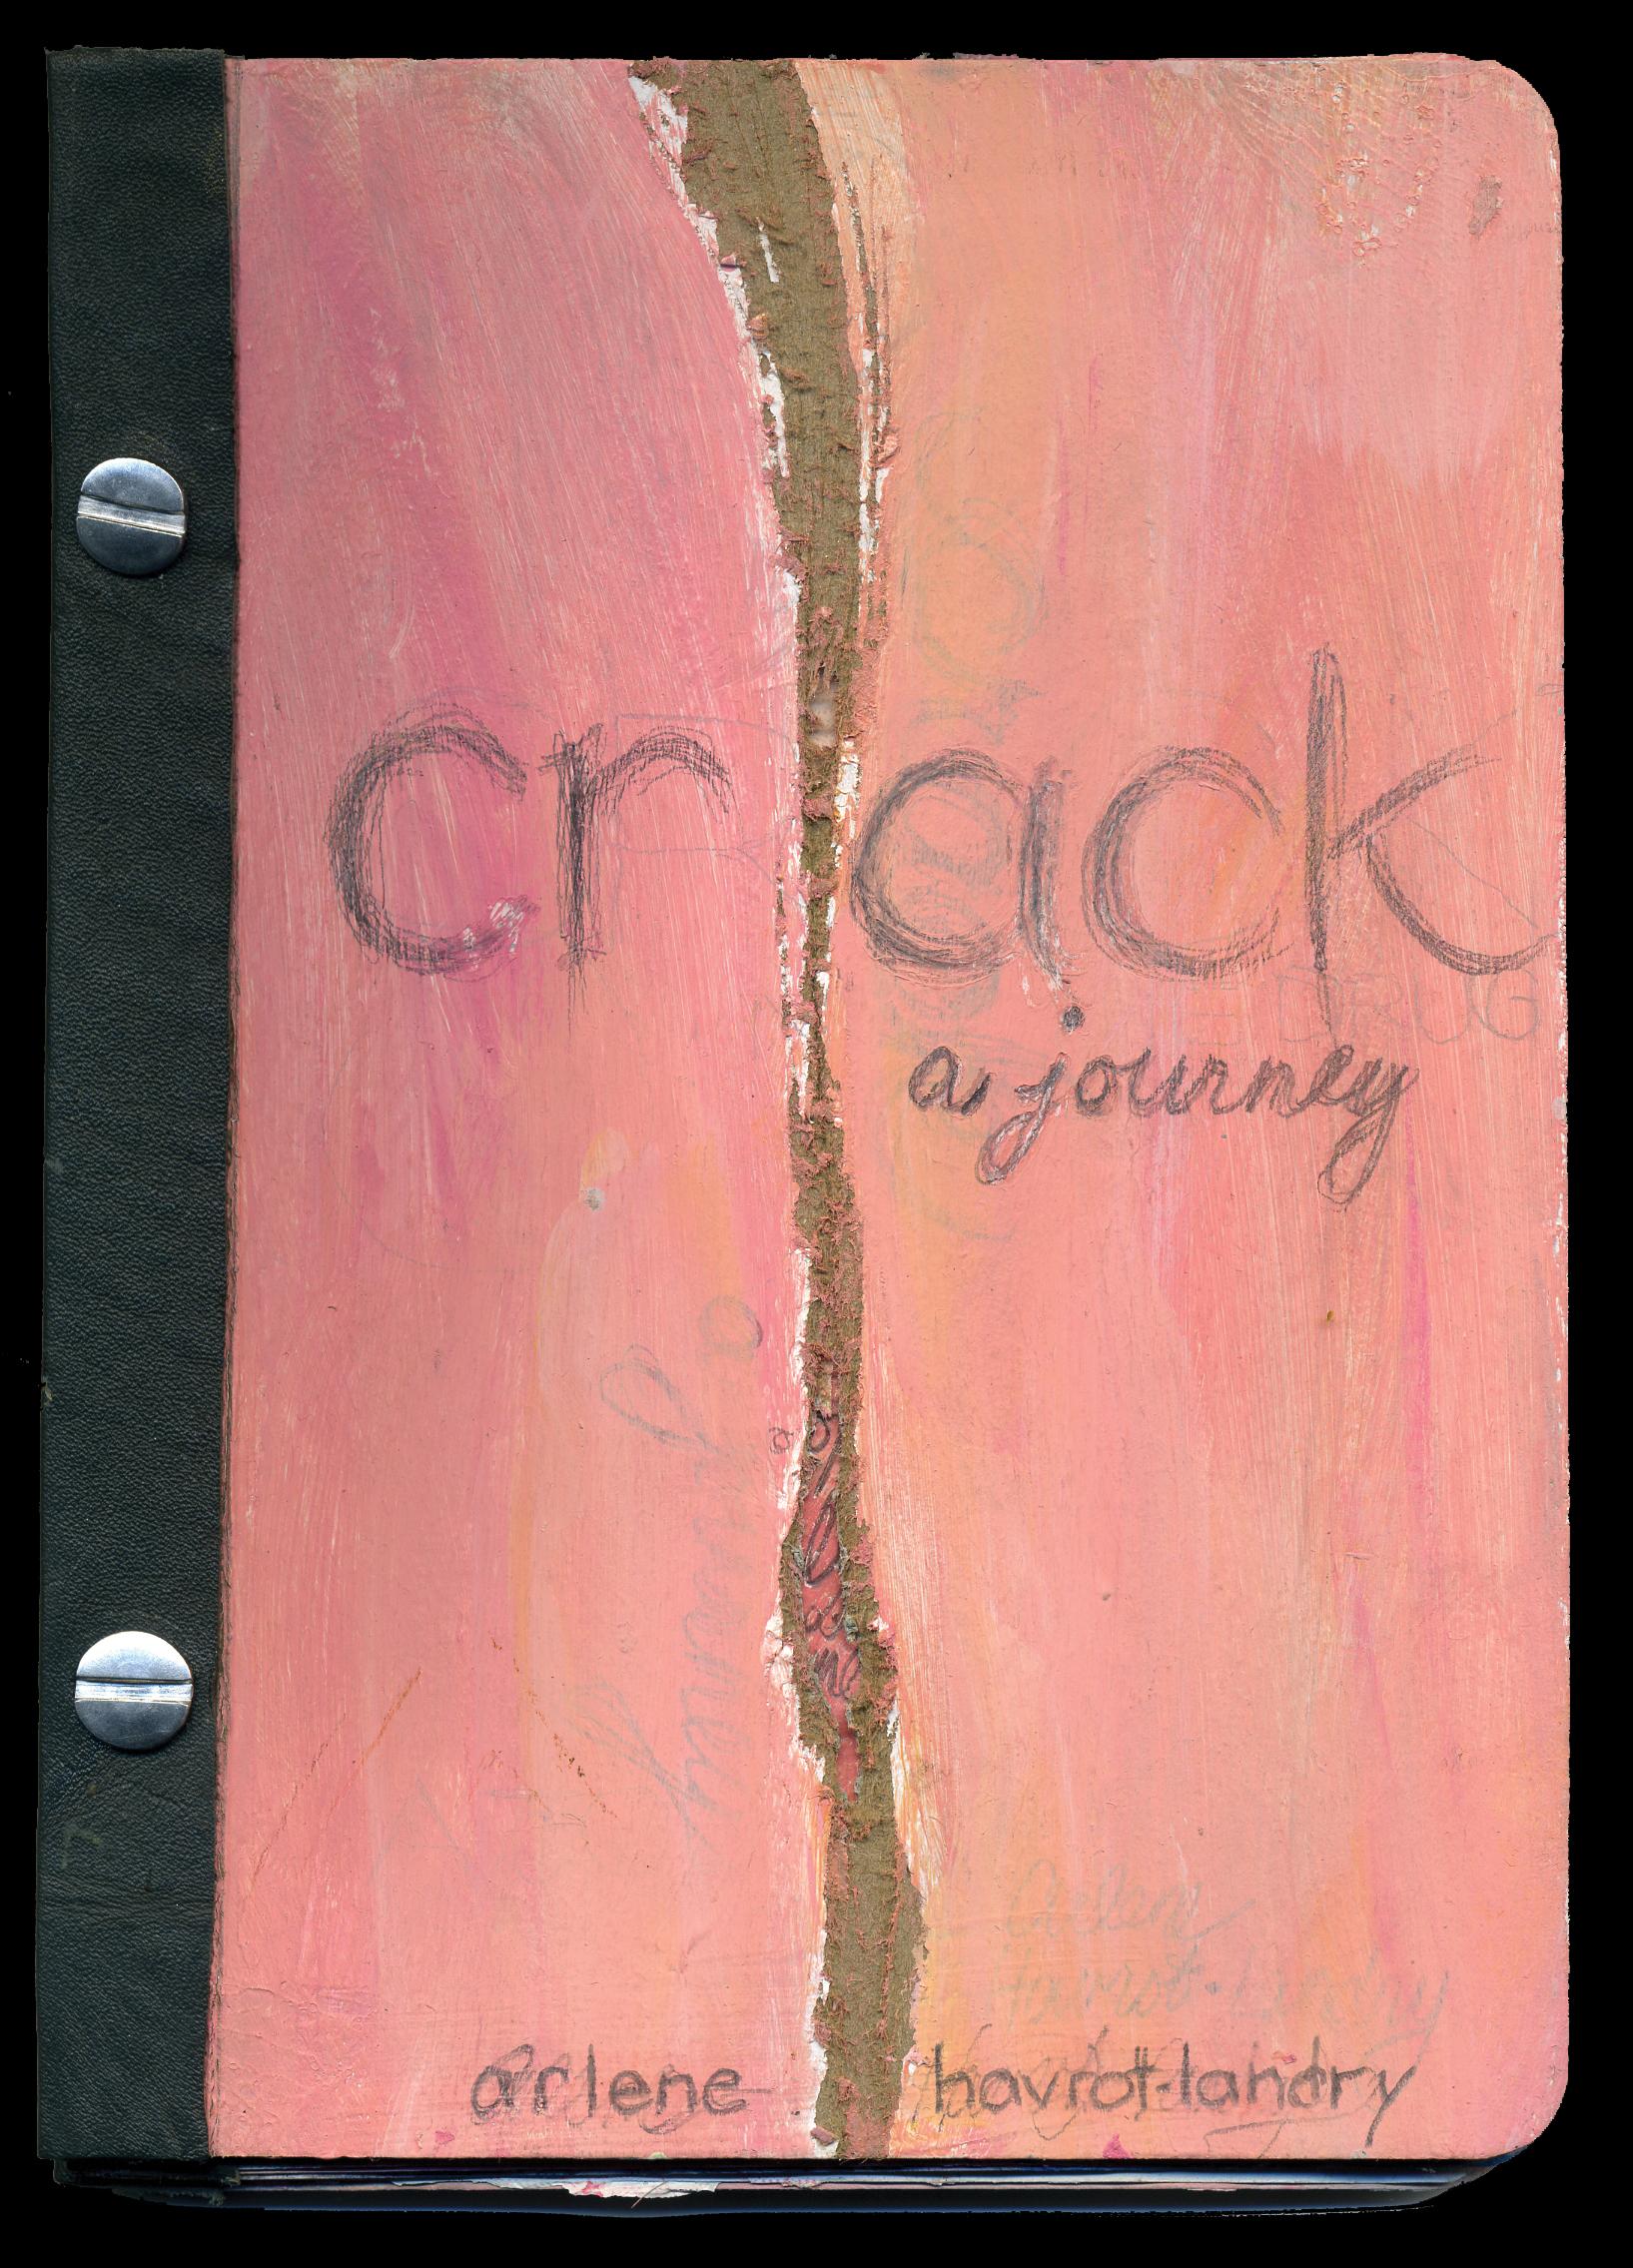 Arlene Havrot-Landry Sketchbook 01